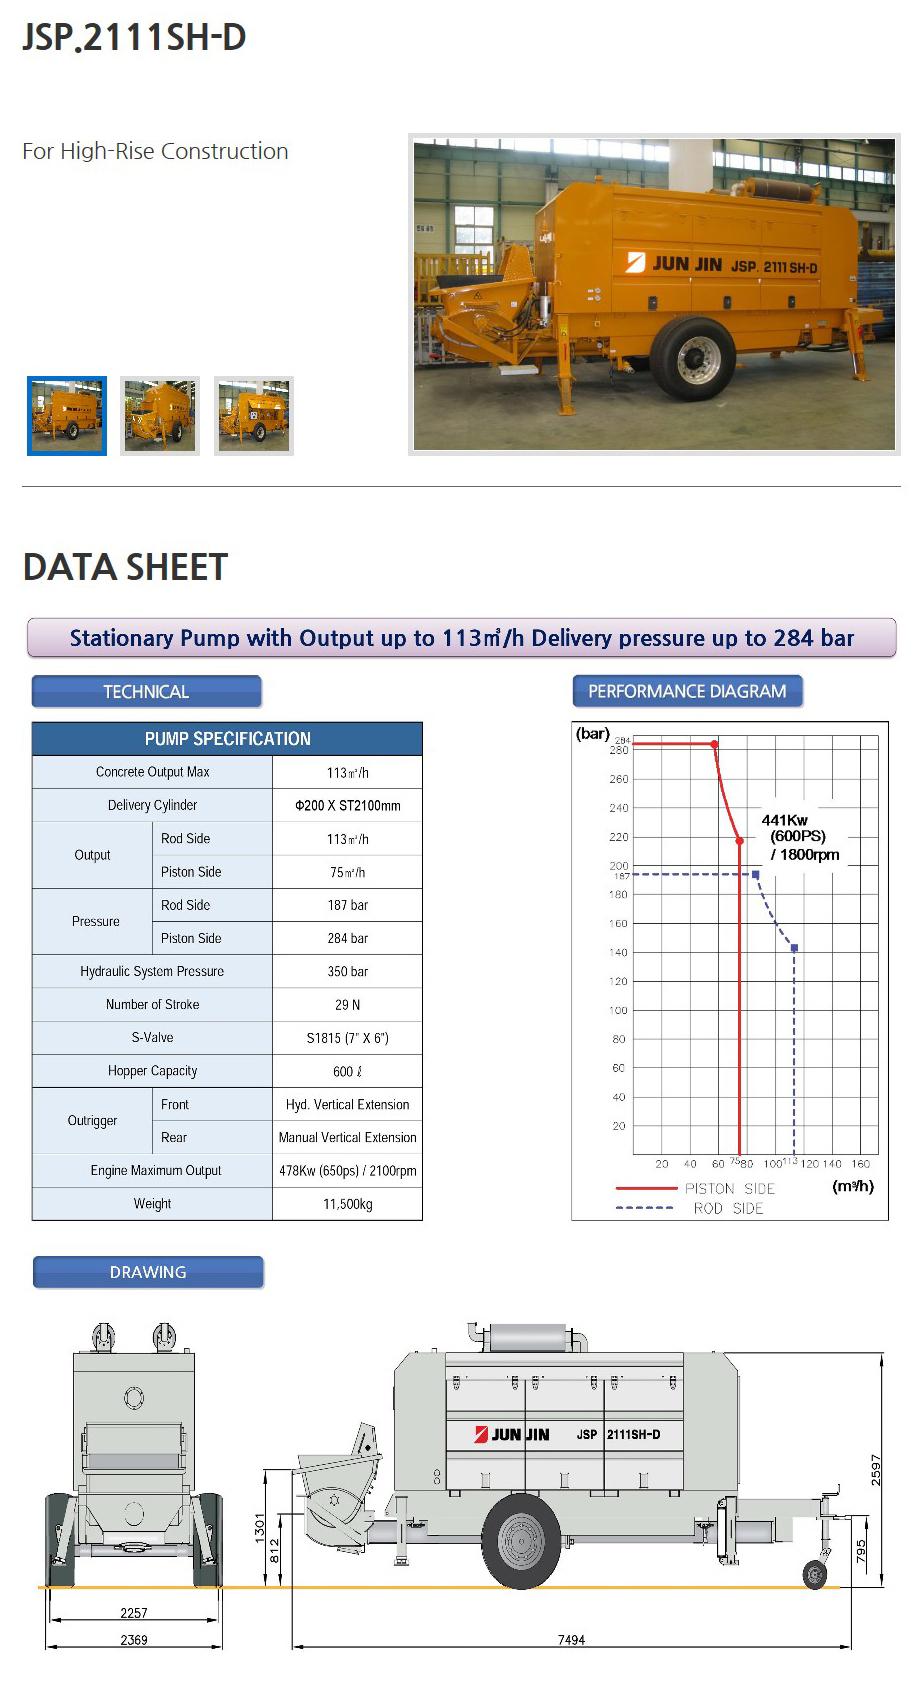 JUNJIN Stationary Pump JSP.2111SH-D